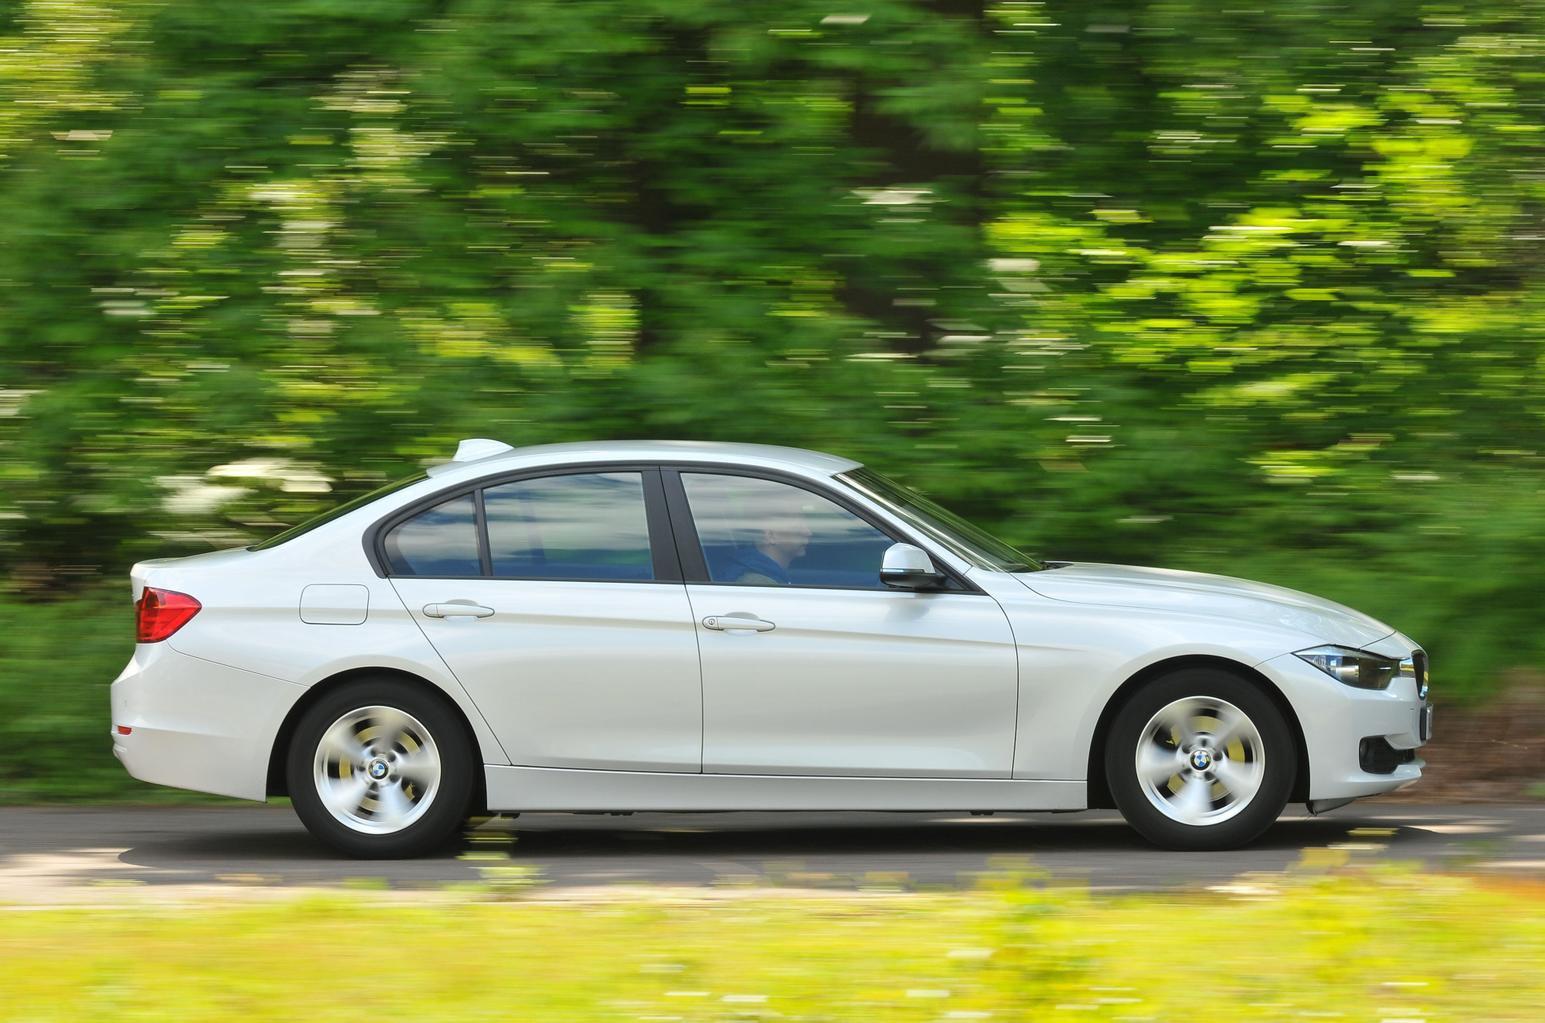 BMW 3 Series saloon (12 - present)